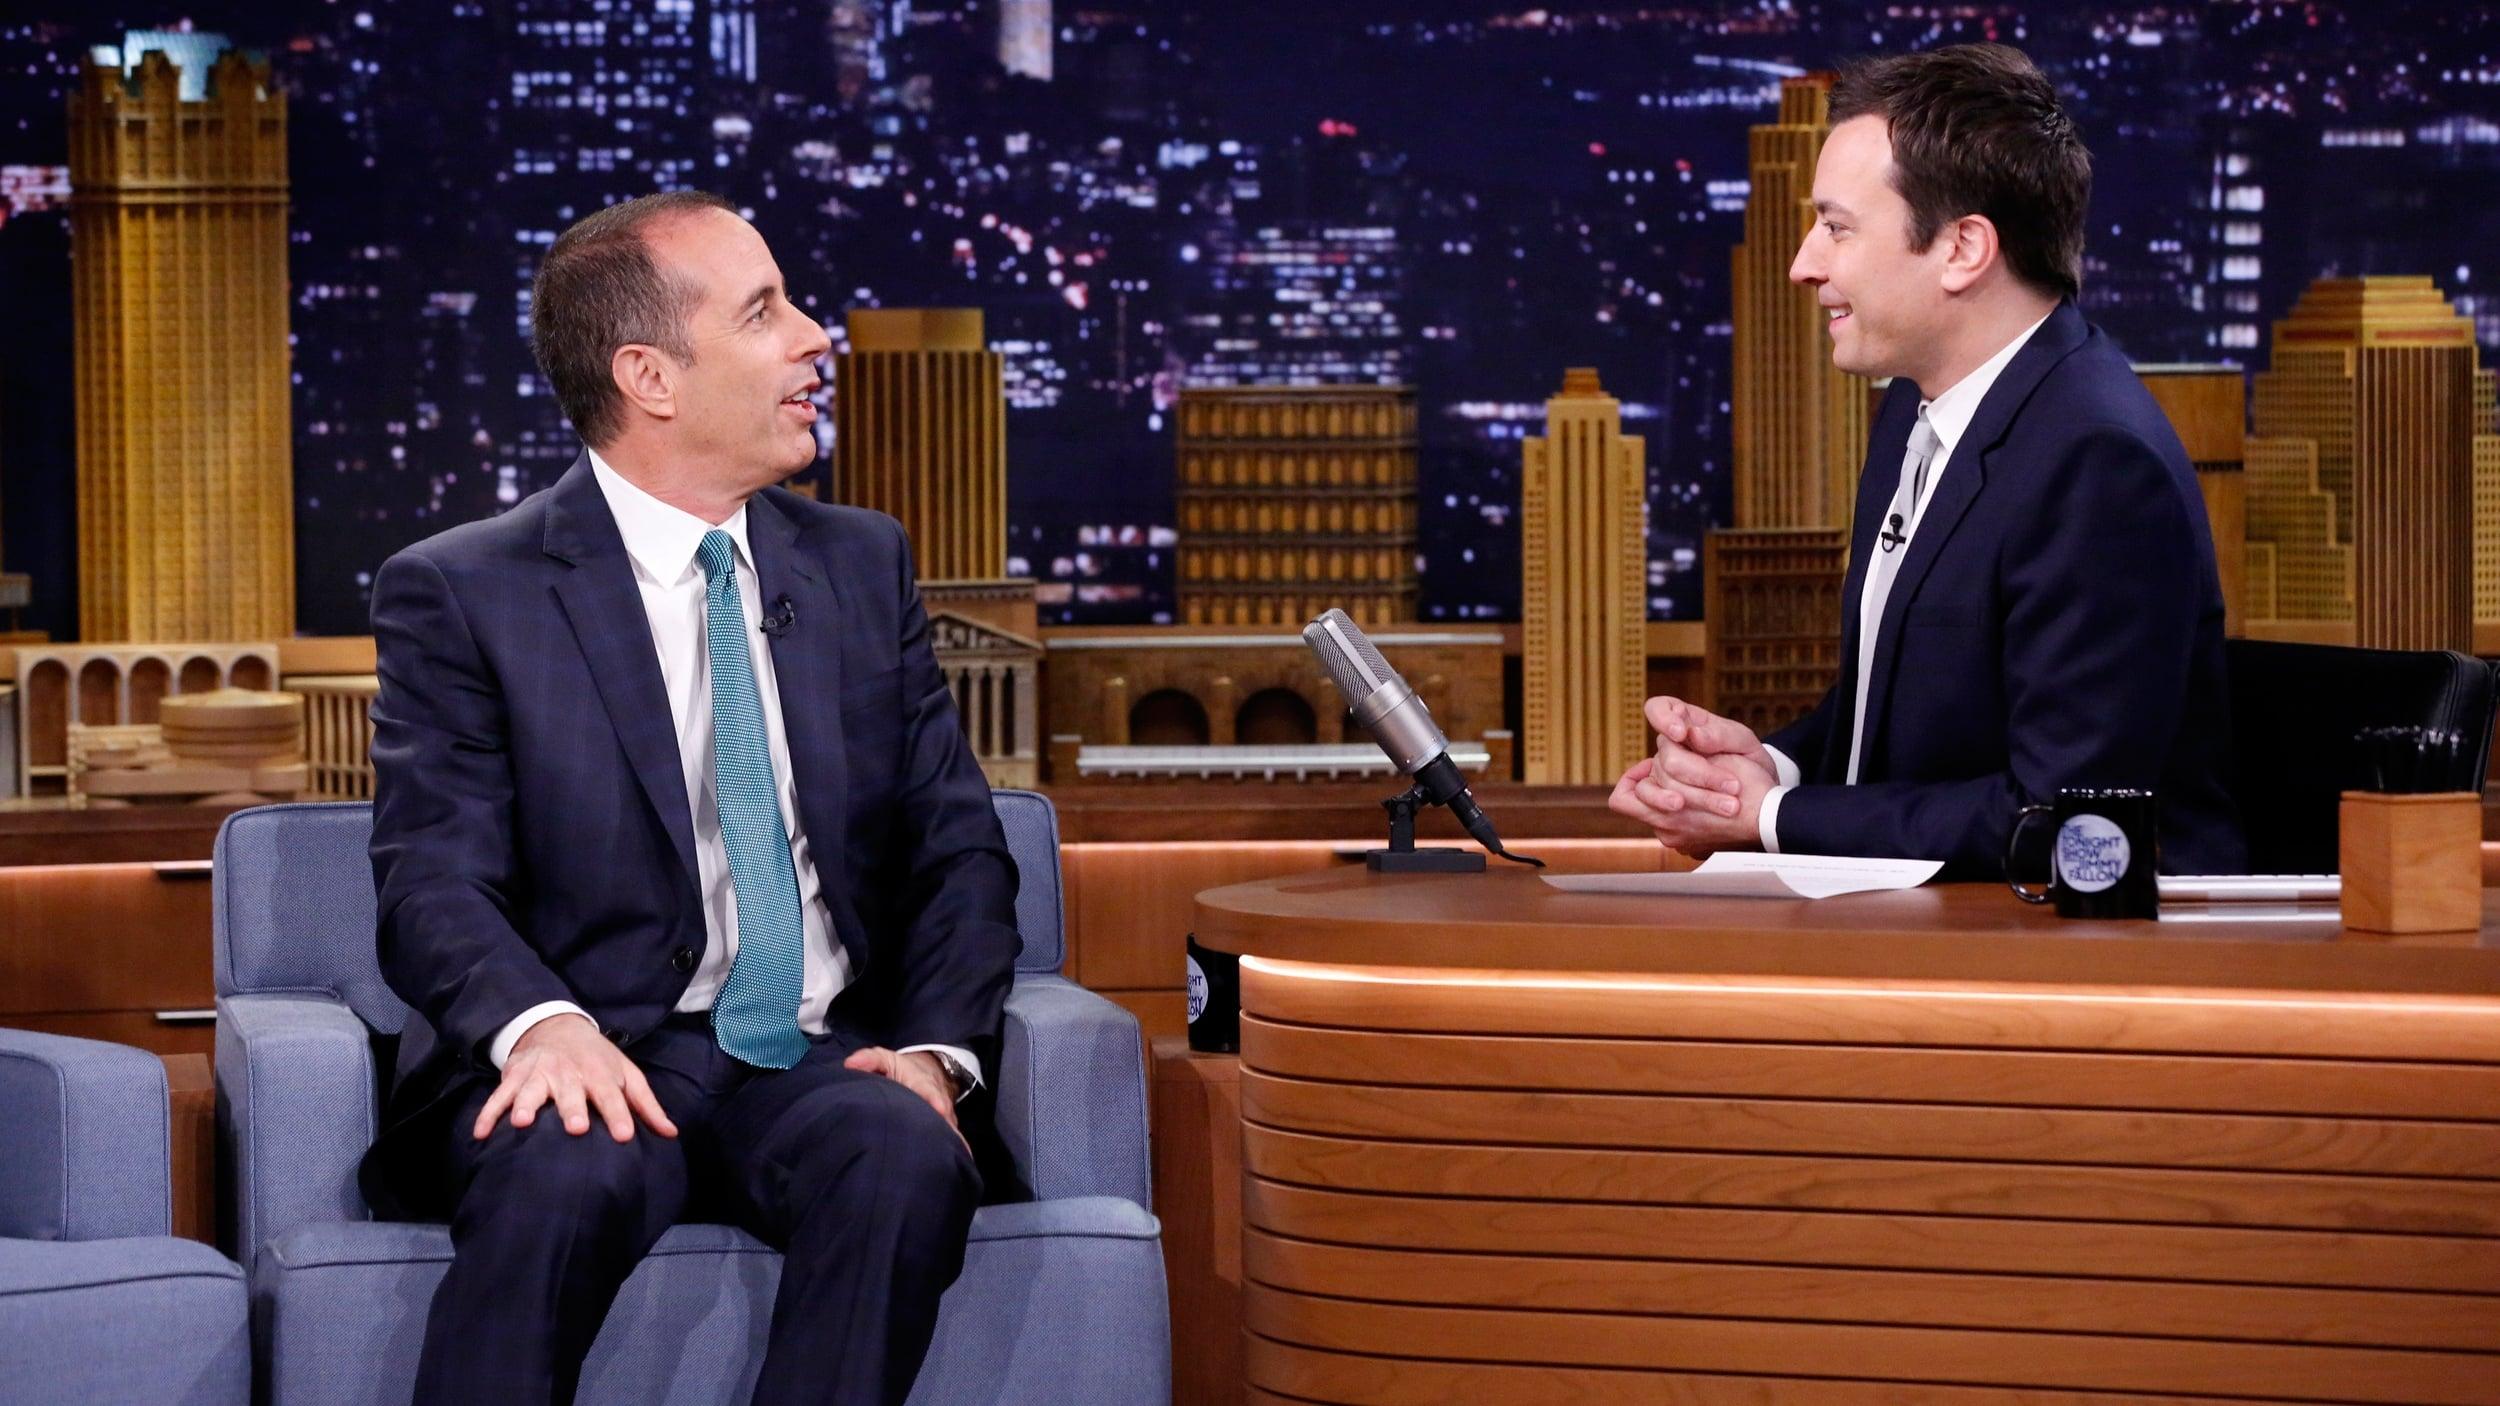 The Tonight Show Starring Jimmy Fallon Season 1 :Episode 2  Jerry Seinfeld, Kristen Wiig, Lady Gaga